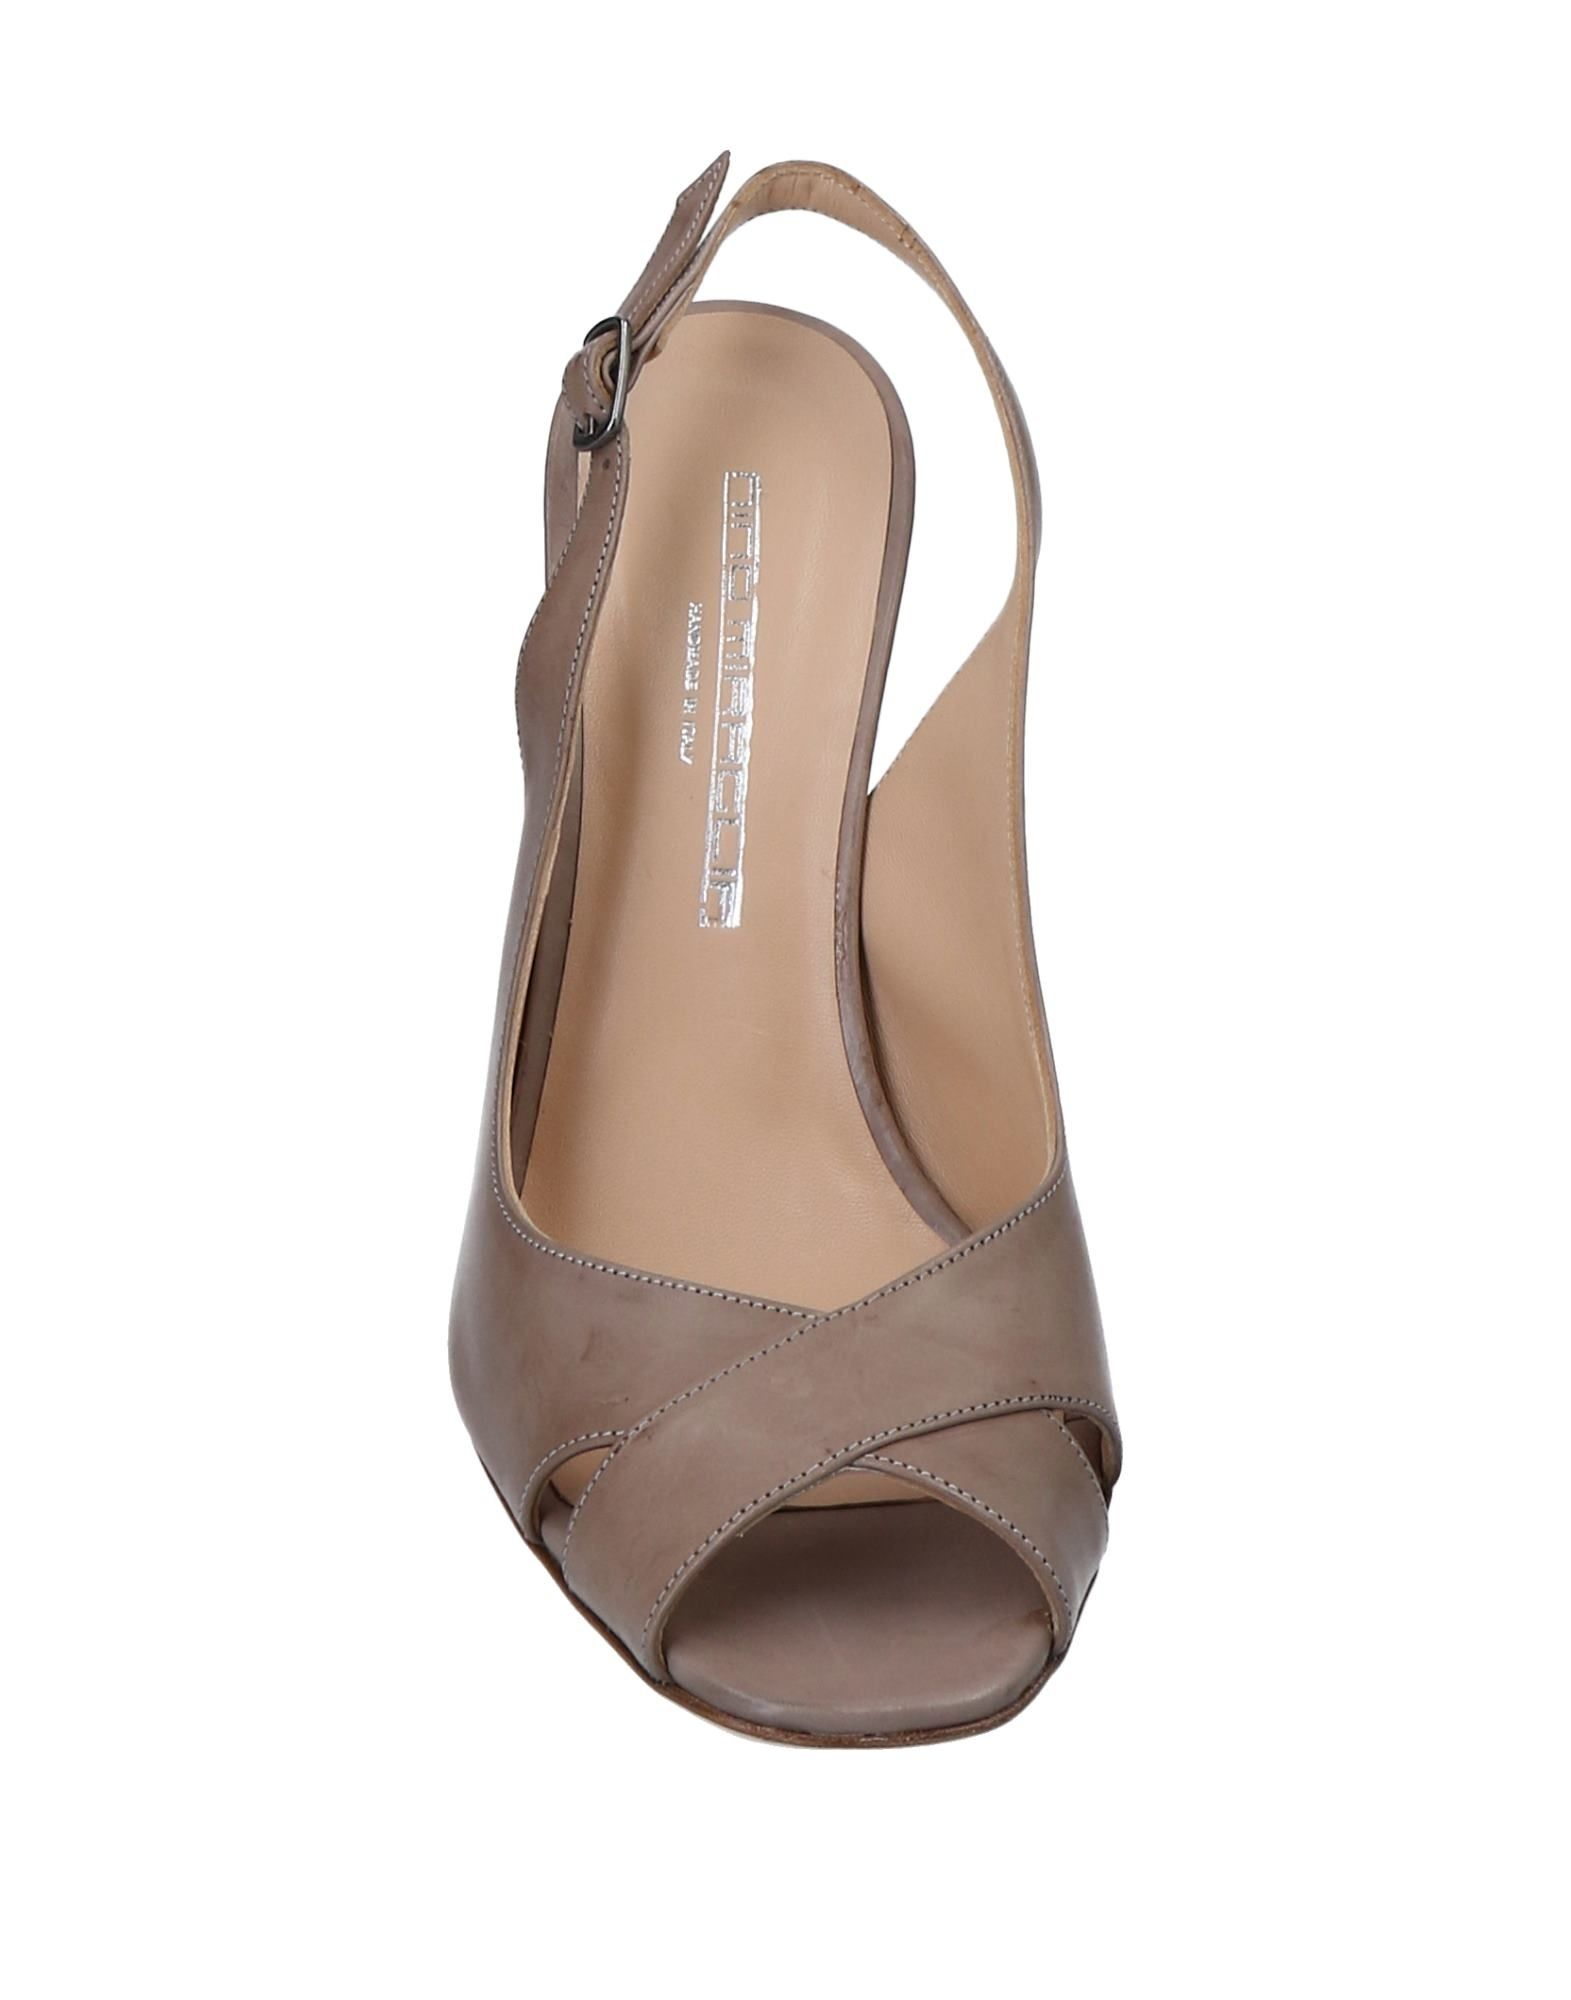 Nino Miraglia Sandalen Qualität Damen  11548871NX Gute Qualität Sandalen beliebte Schuhe e81076